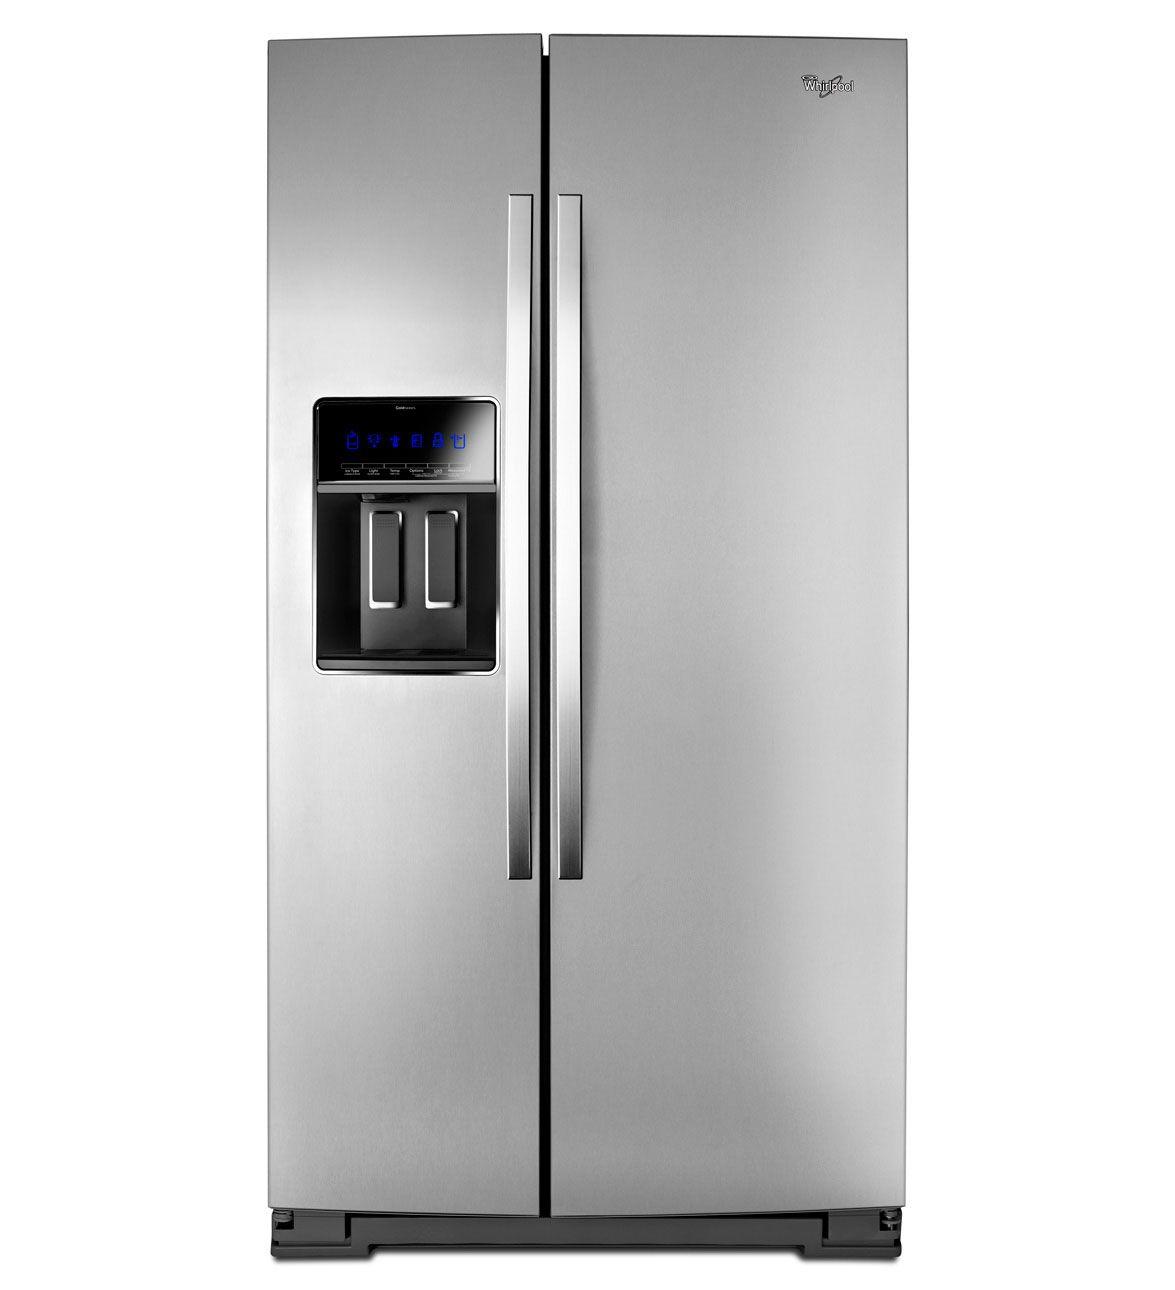 28+ Whirlpool gold refrigerator ice maker ideas in 2021